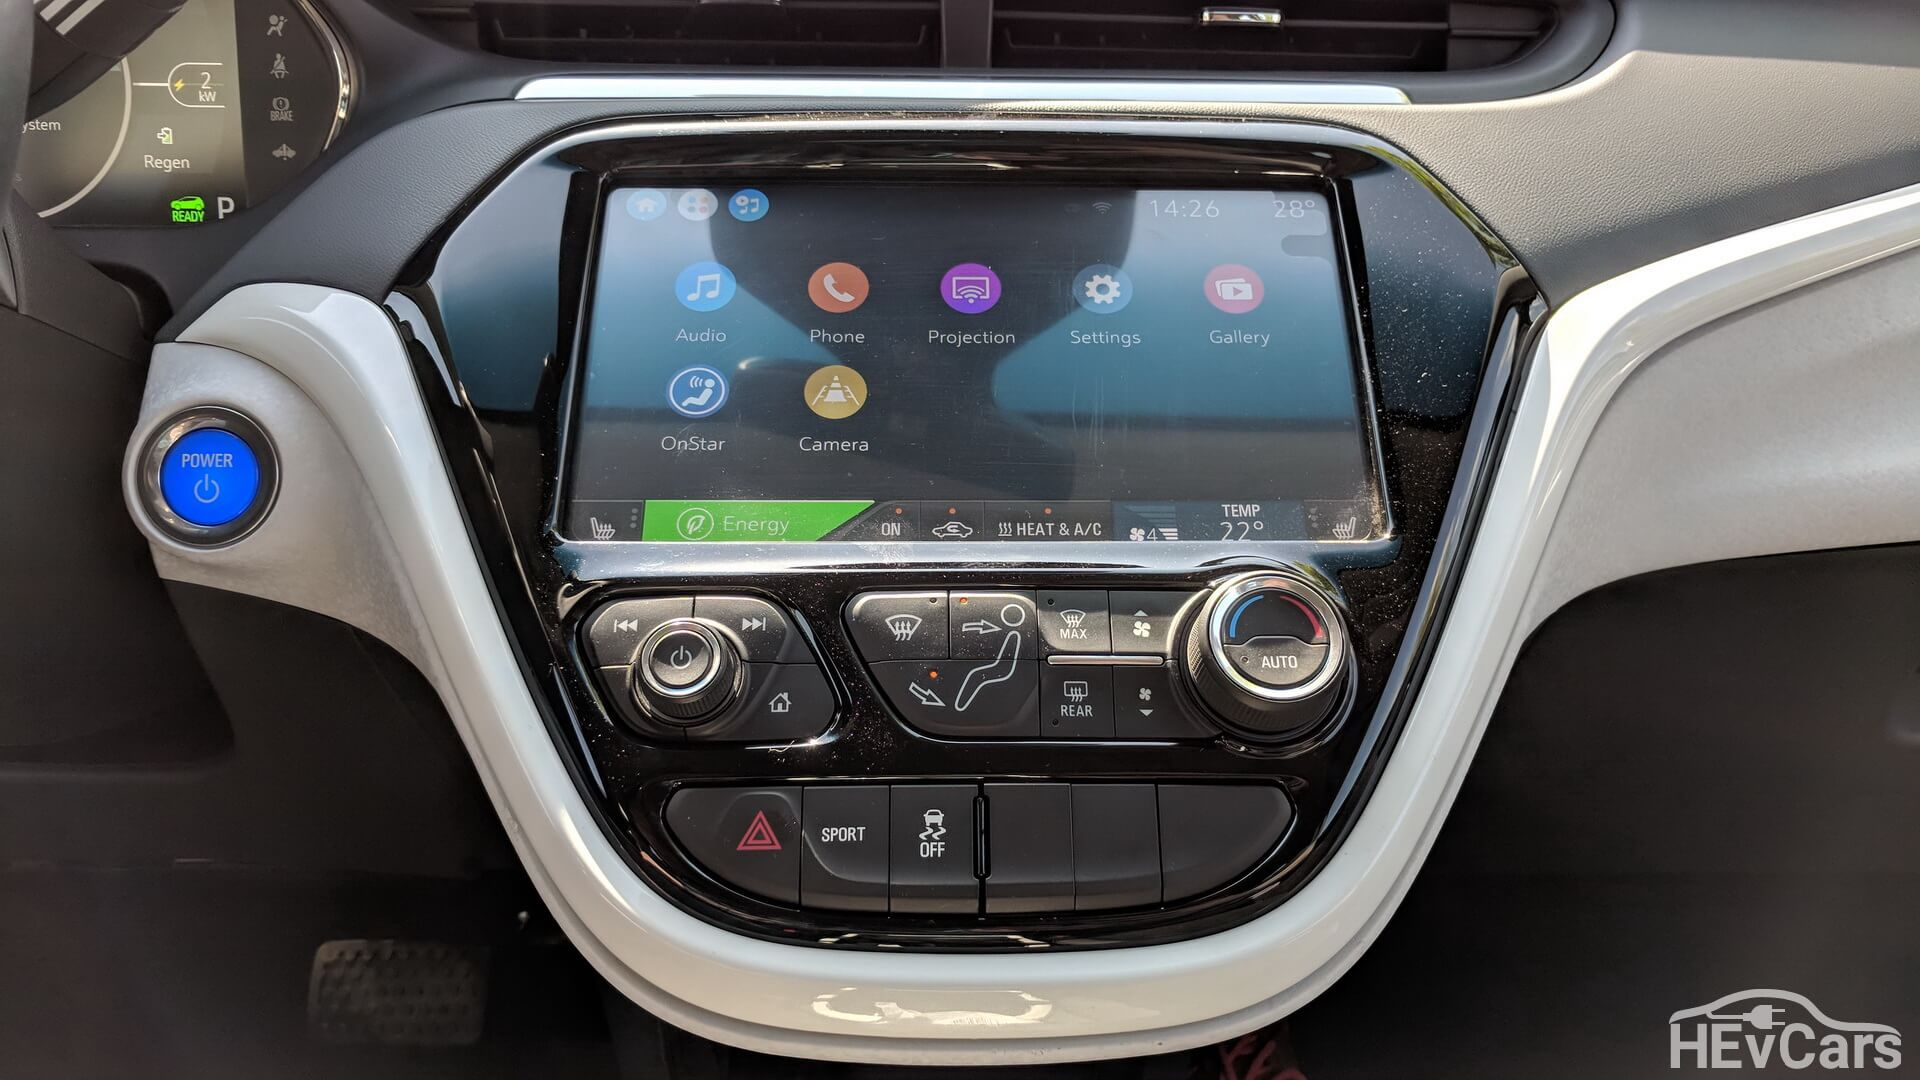 Центральная консоль электромобиля Chevrolet Bolt